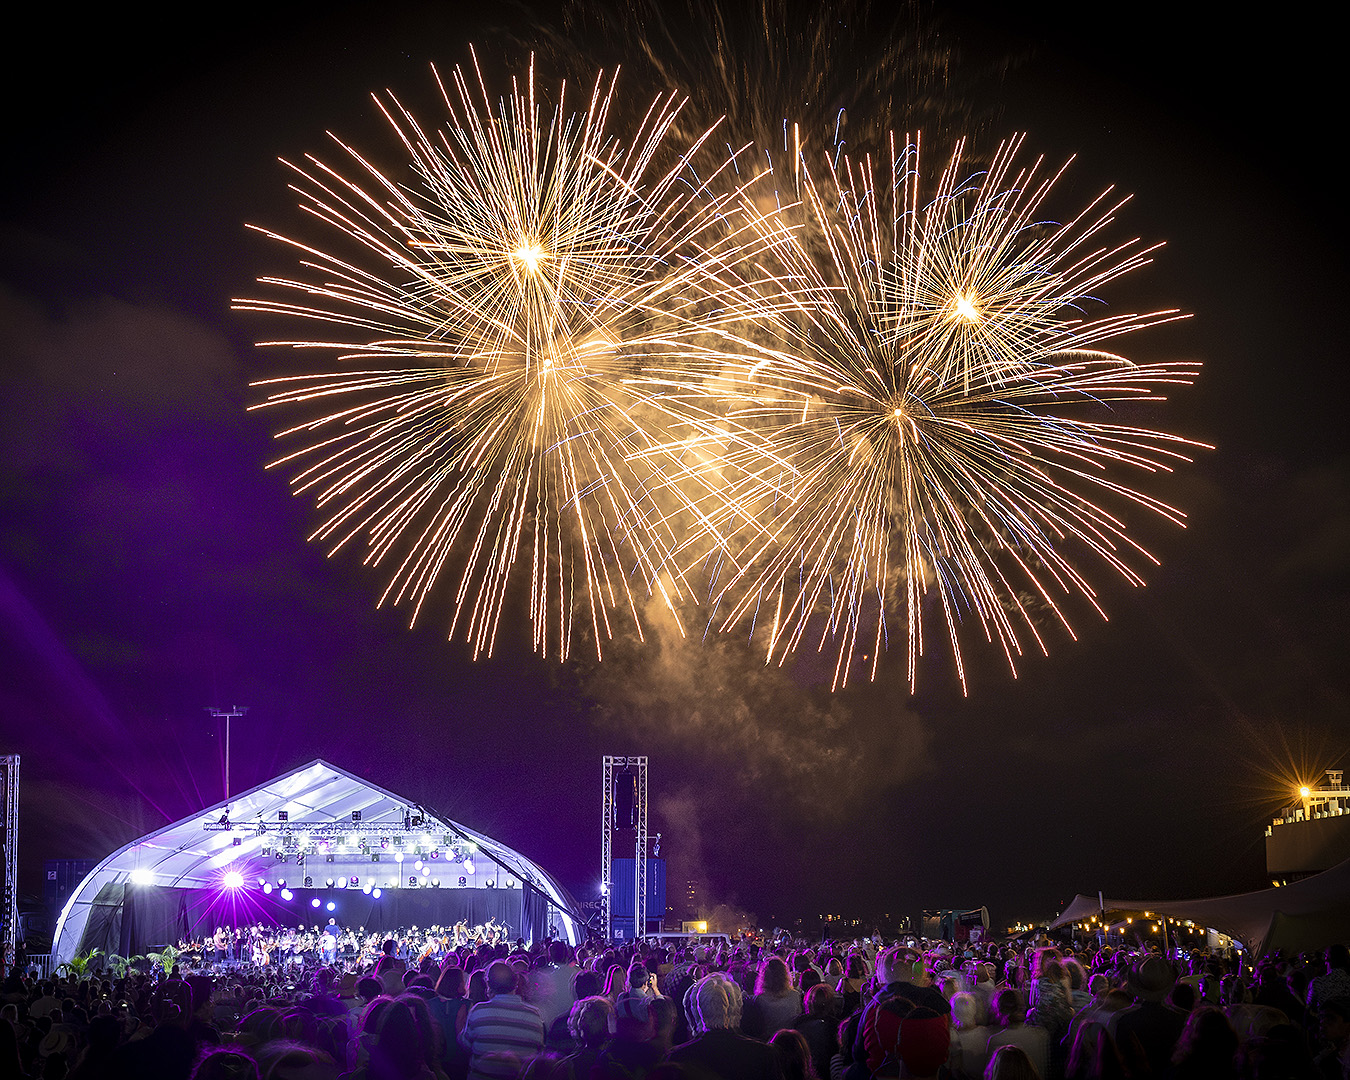 Fireworks light up the sky above the Seeport Festival.